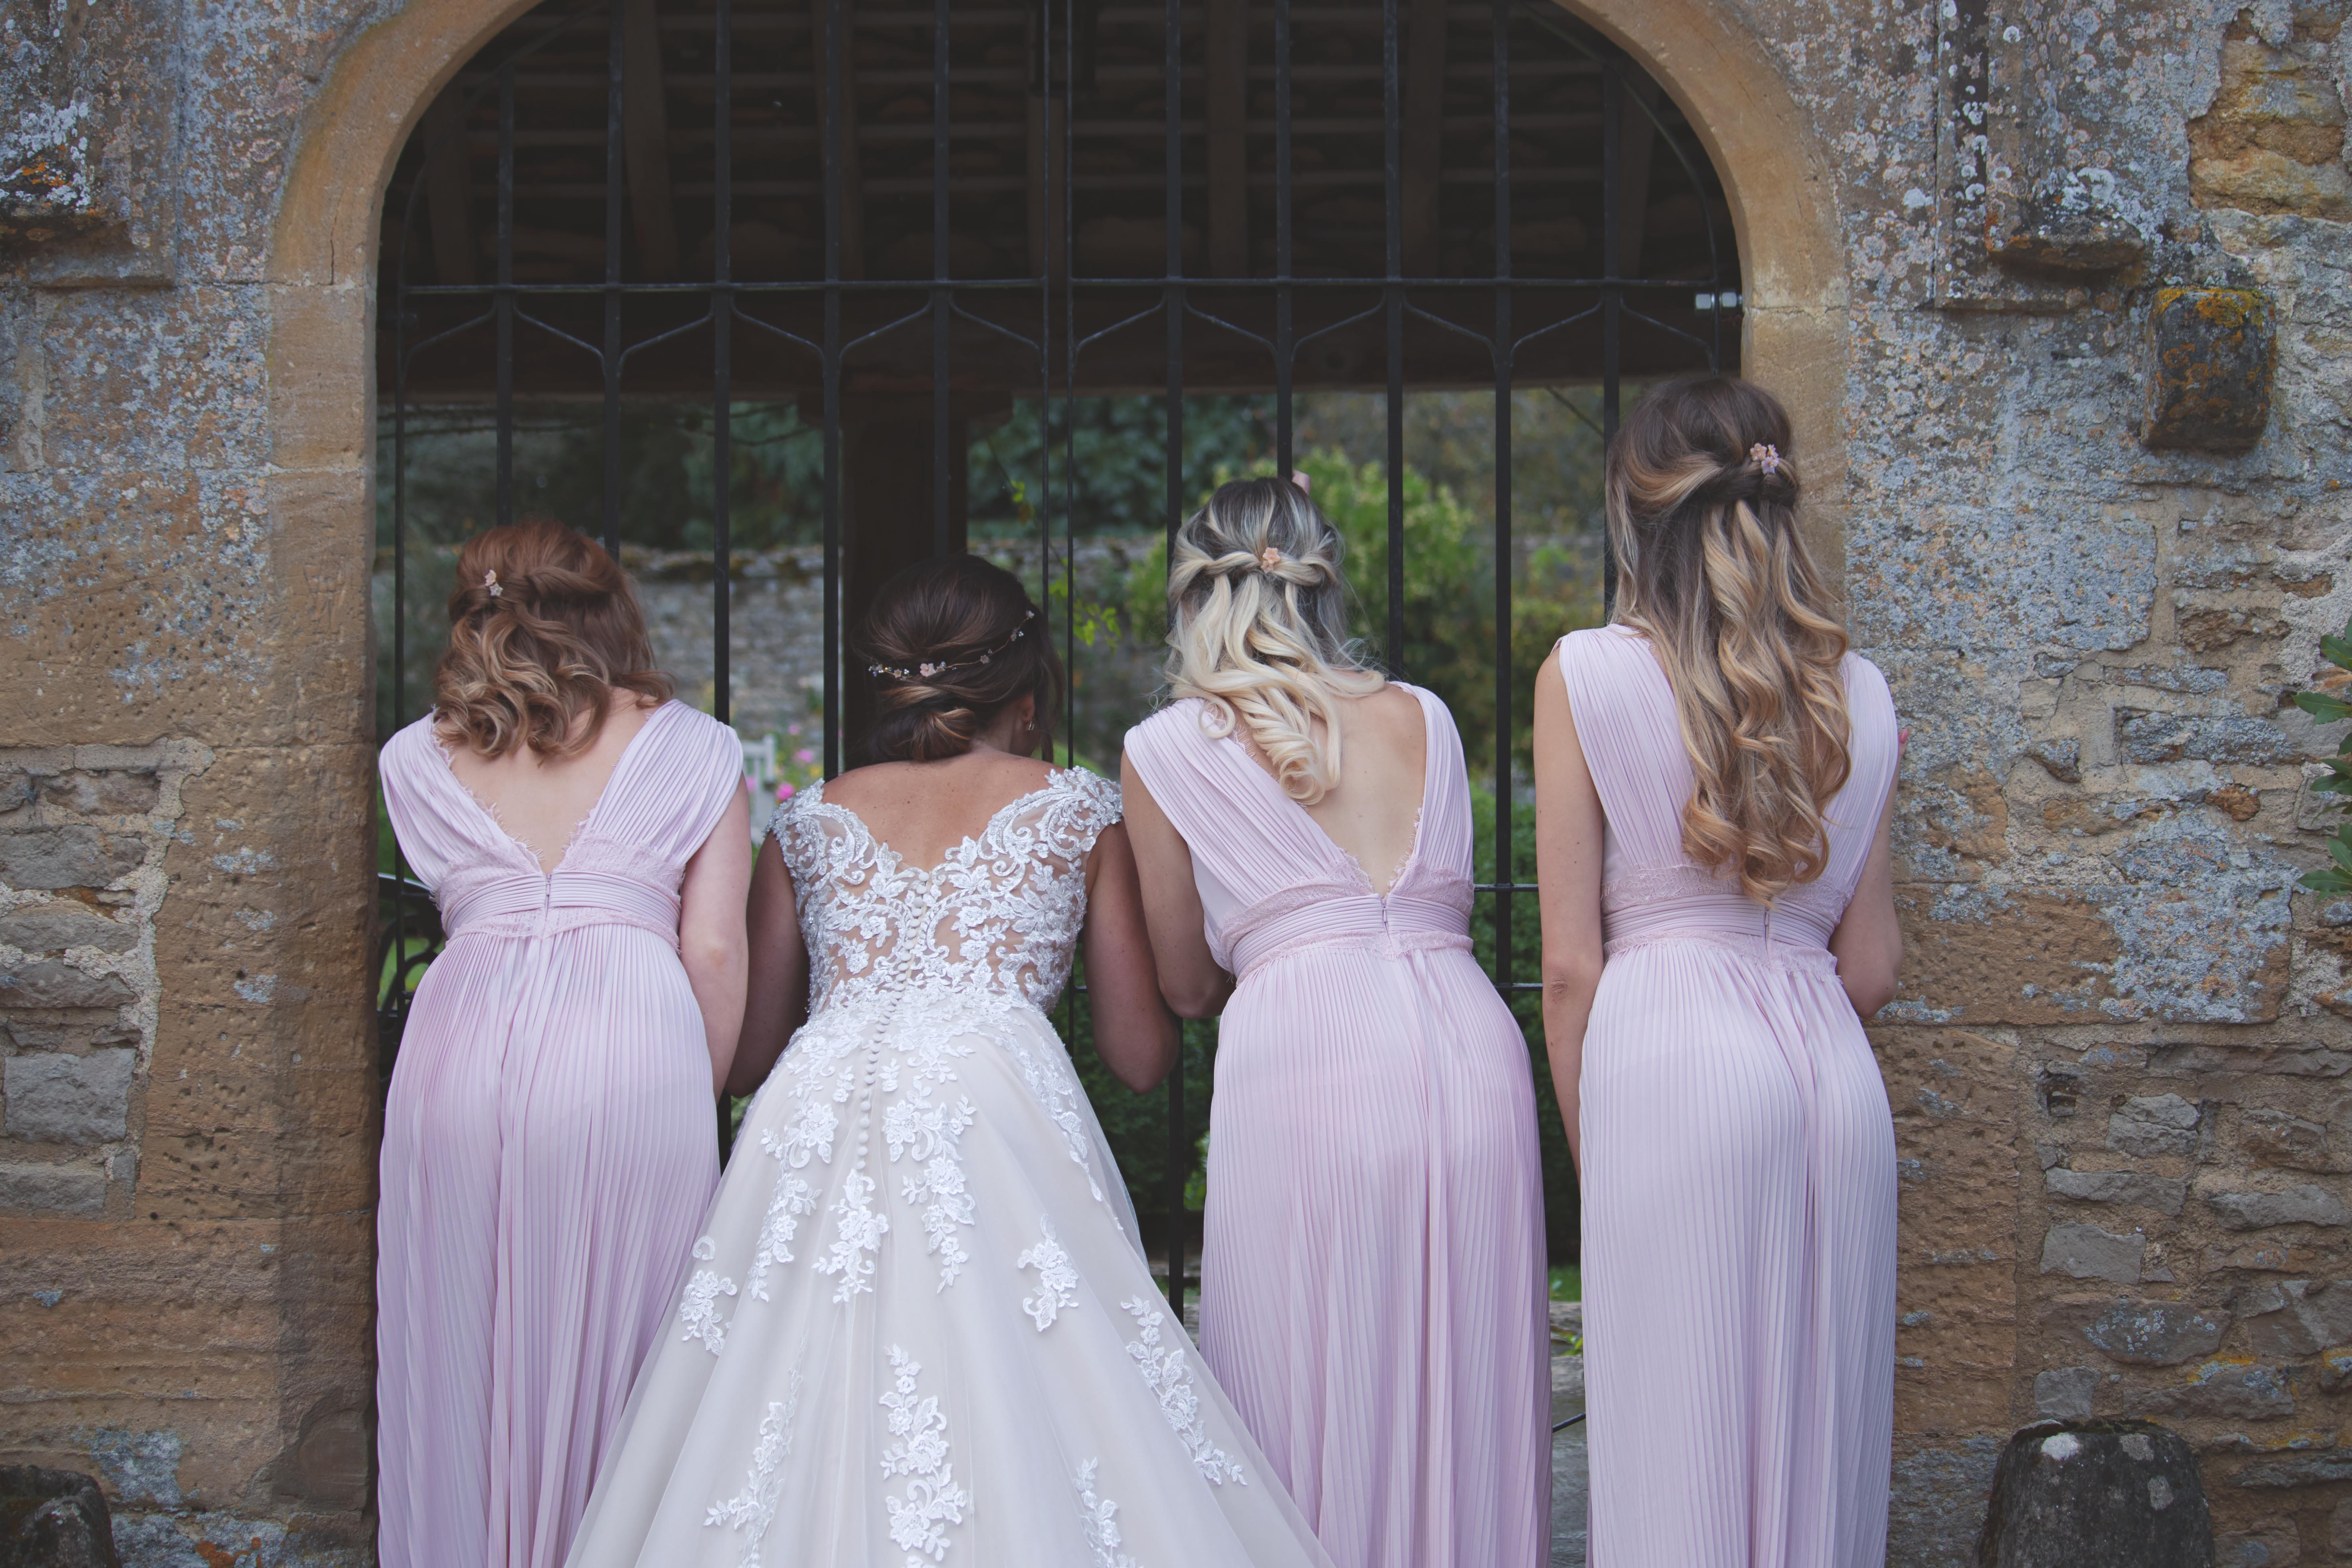 Sweet Shots of Bride and Bridesmaids